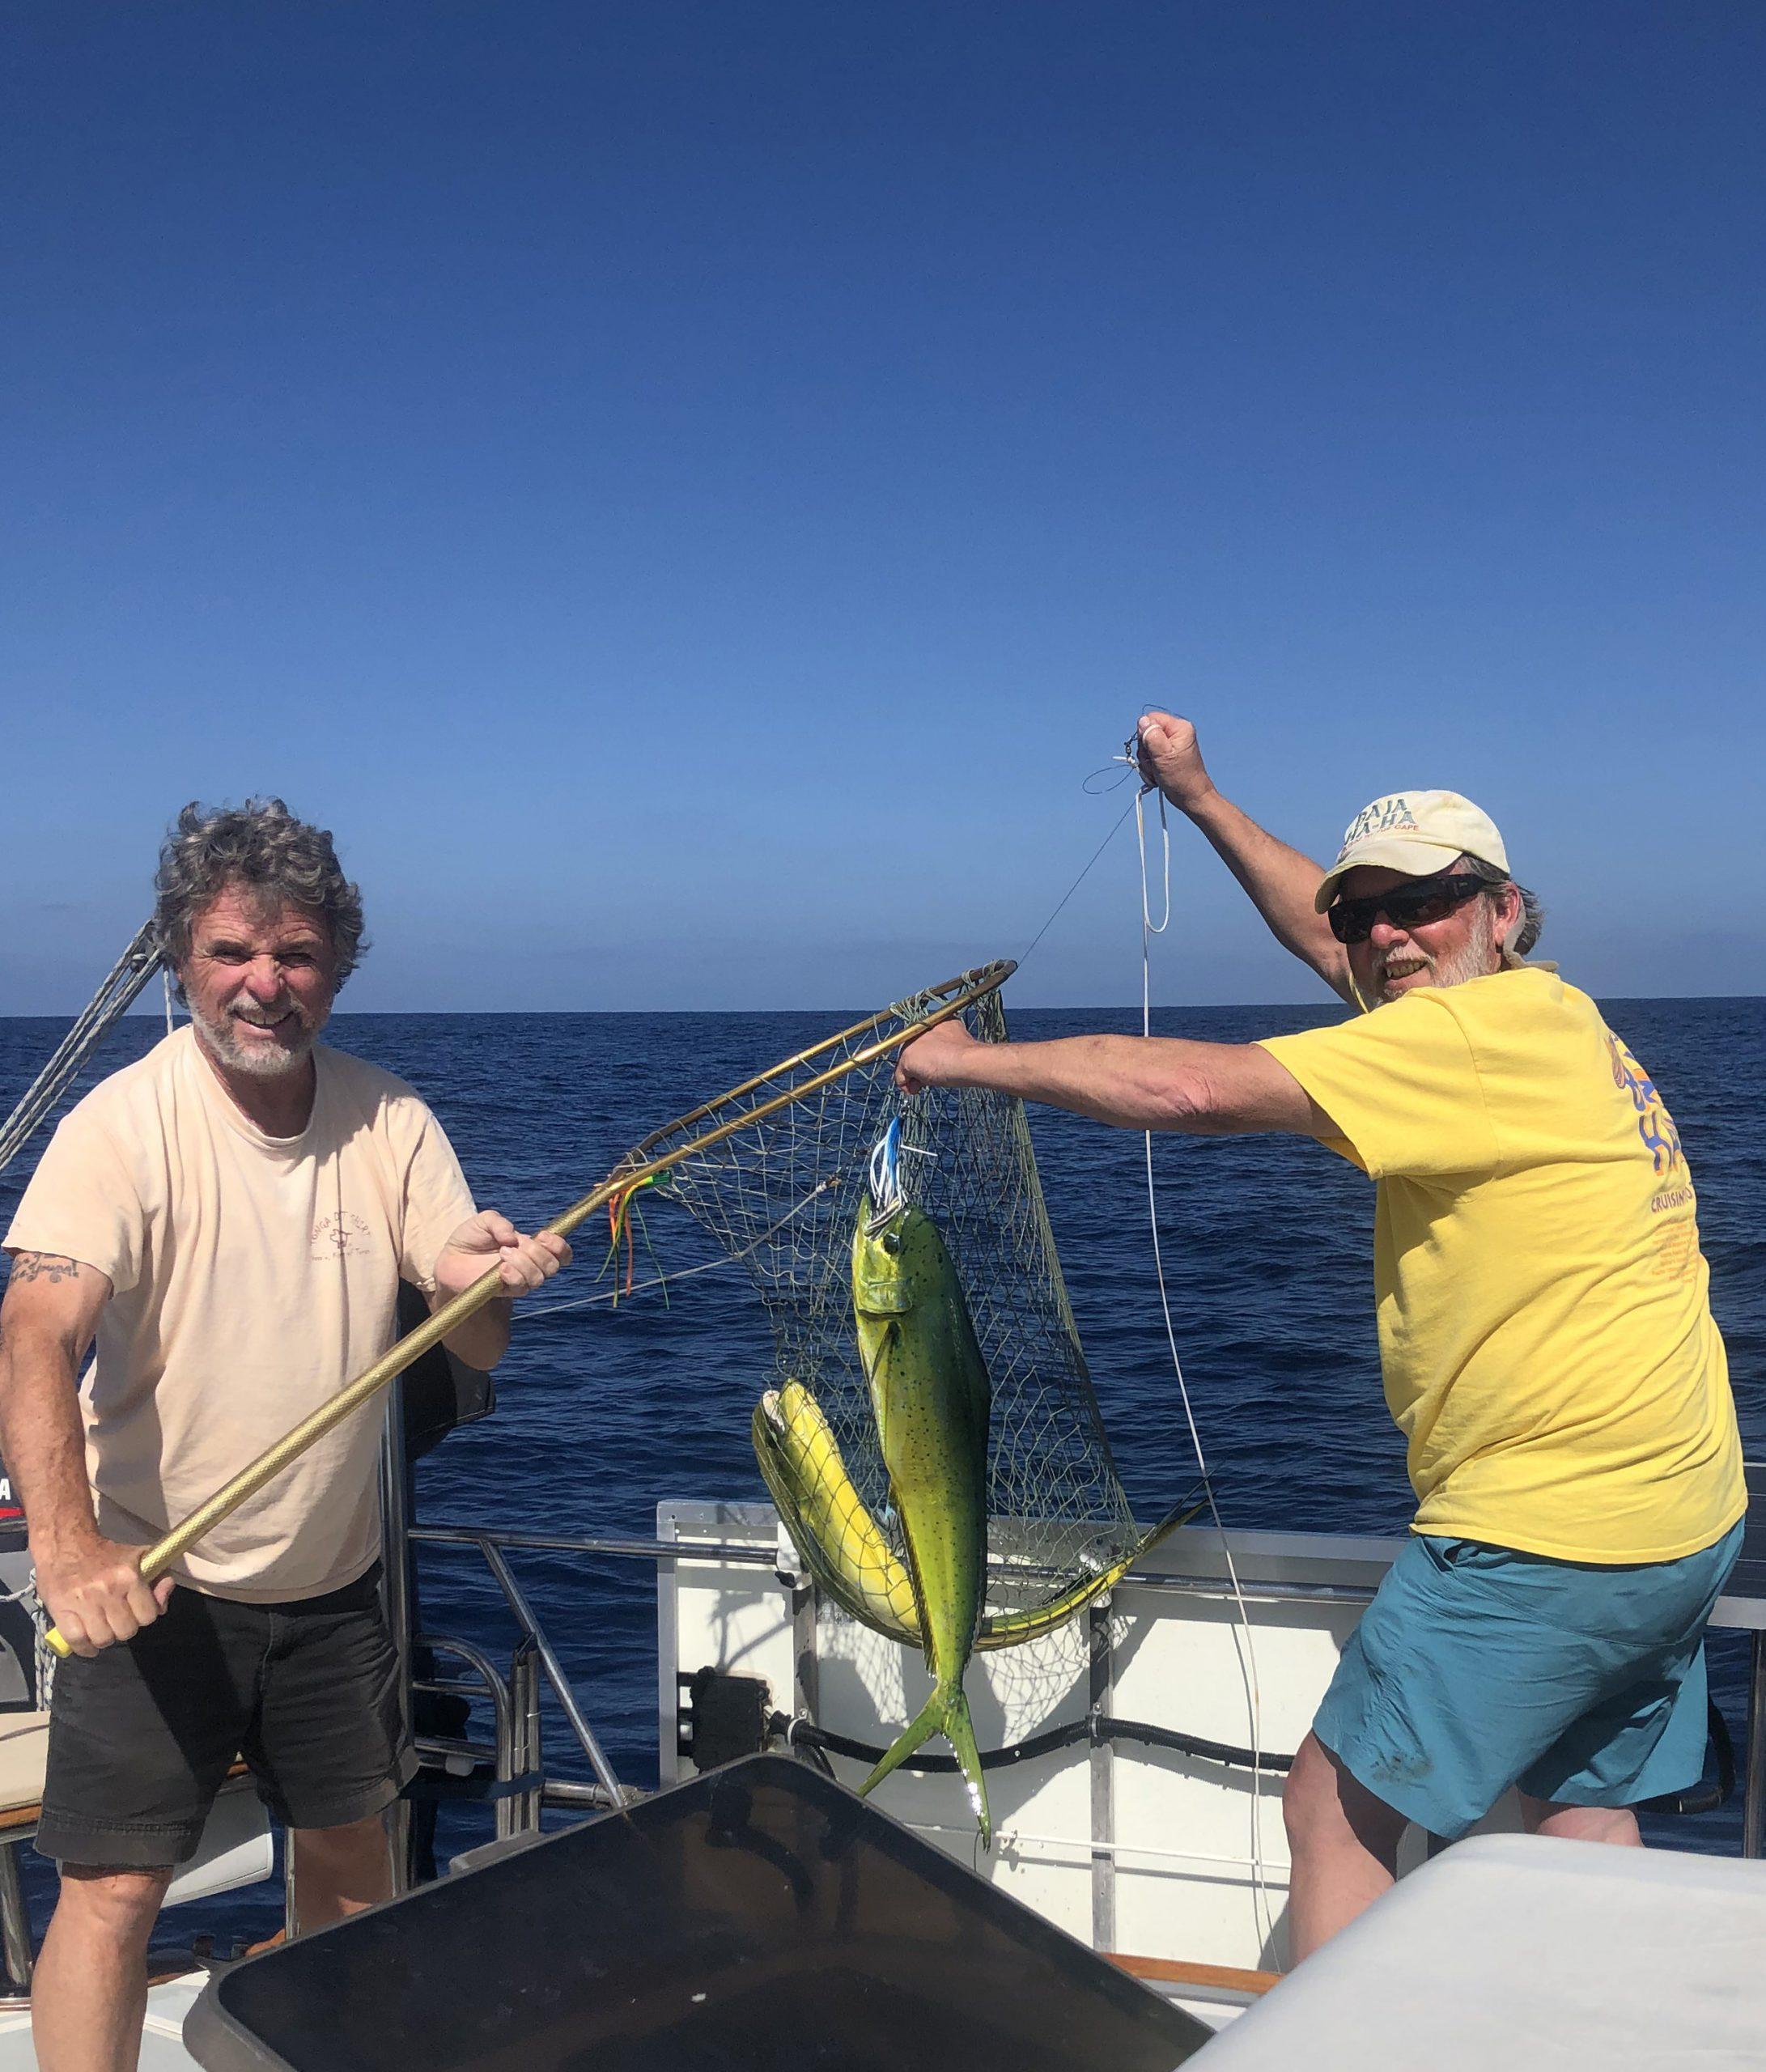 Catching fish during Nada Ha-Ha